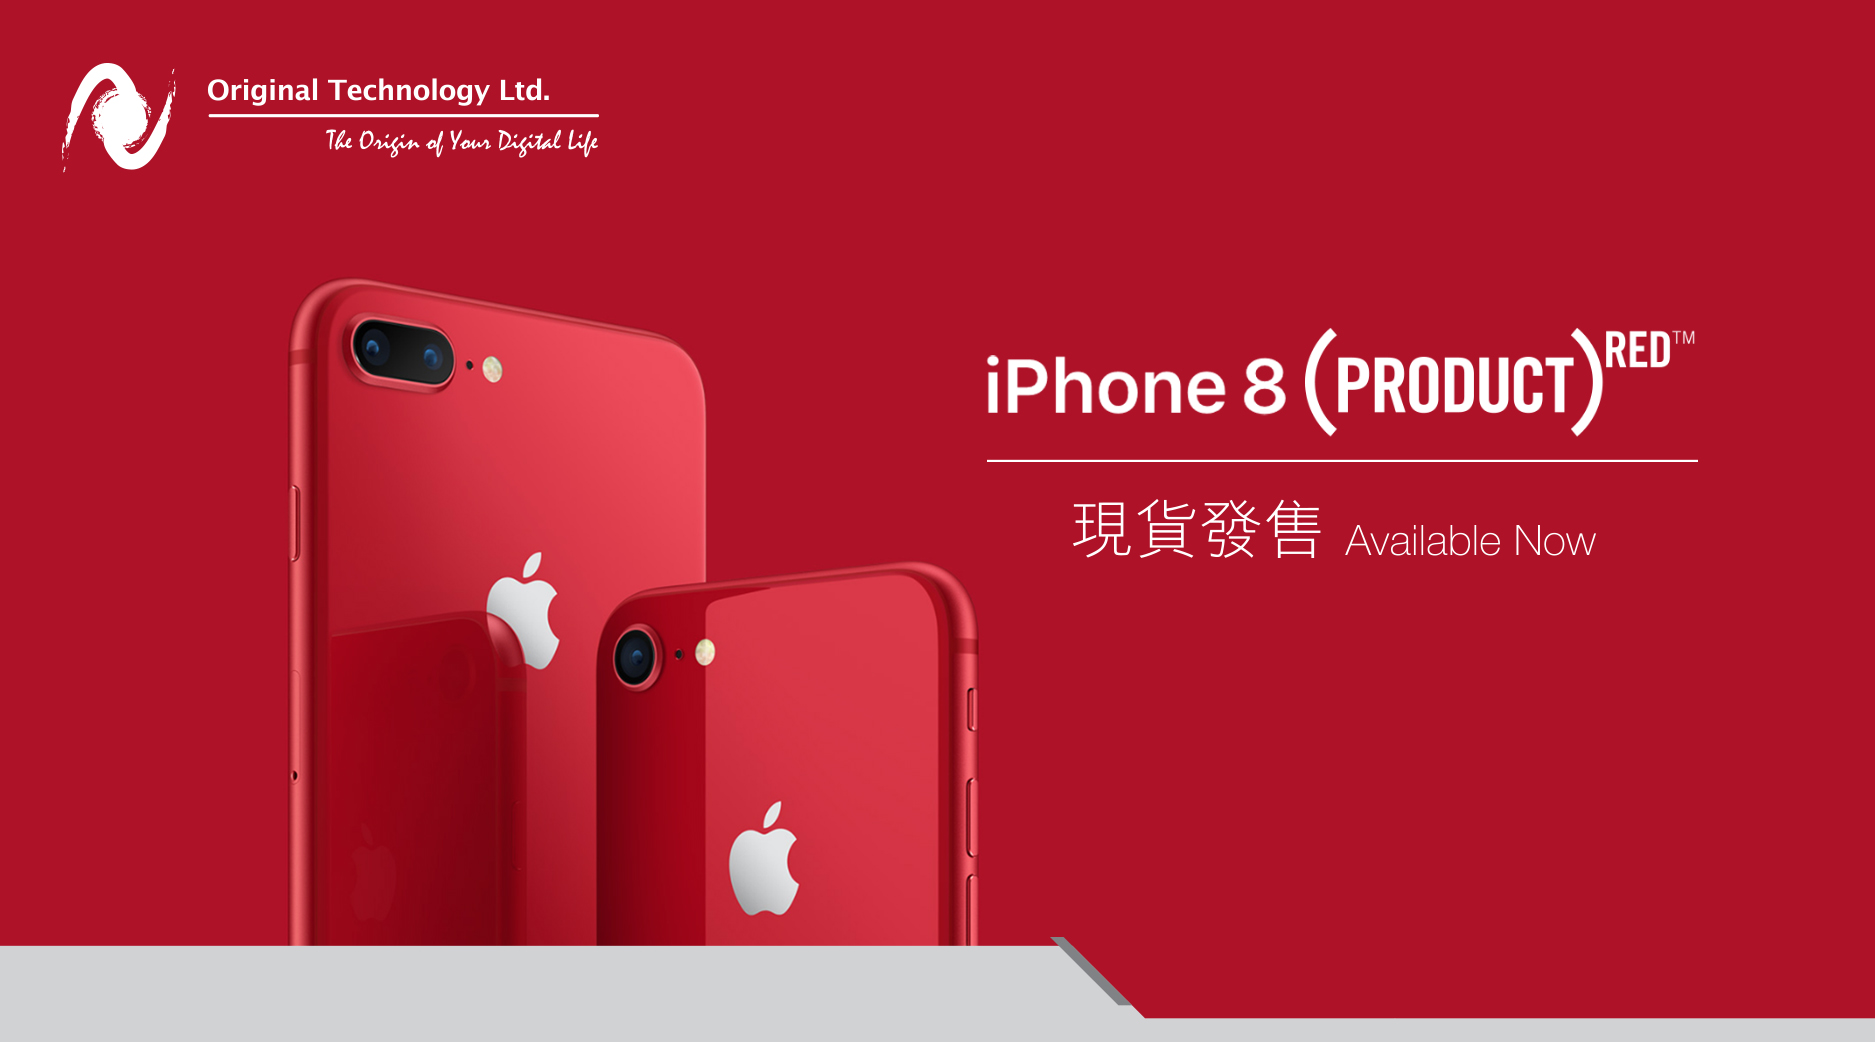 iPhone_RED_900x500.jpg